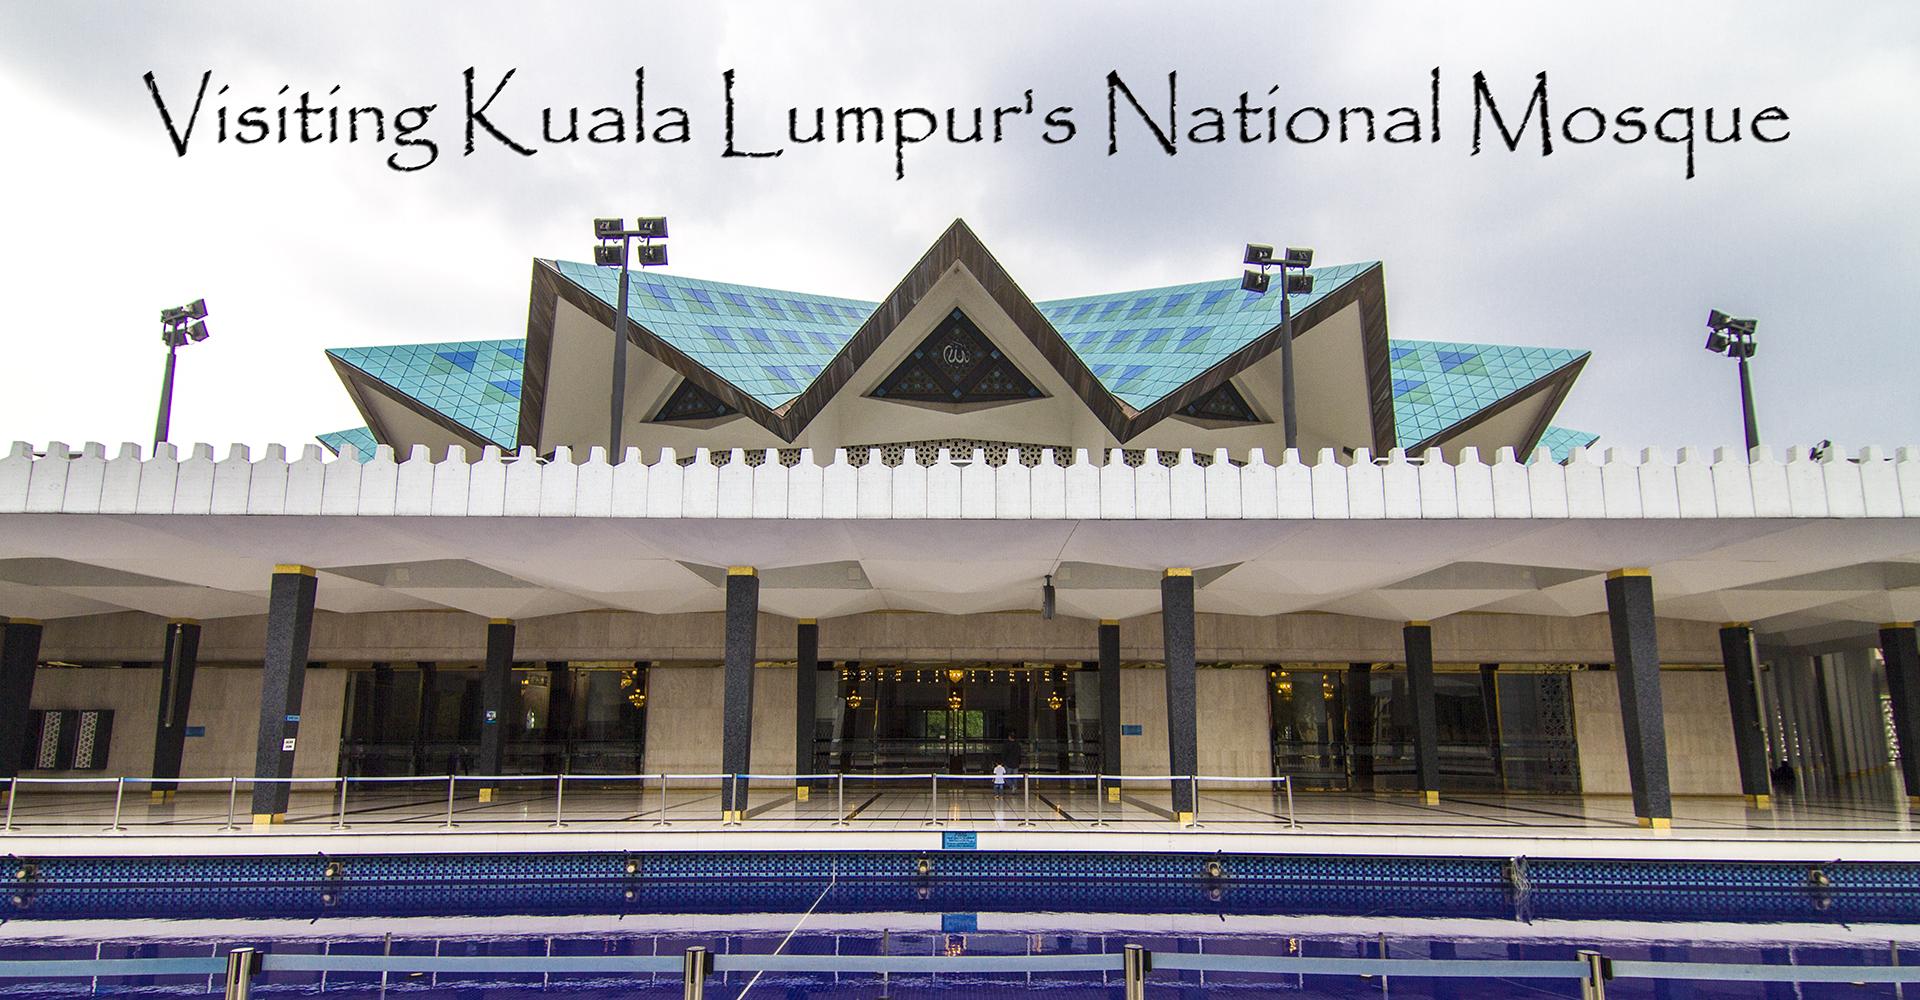 Visiting Kuala Lumpurs National Mosque